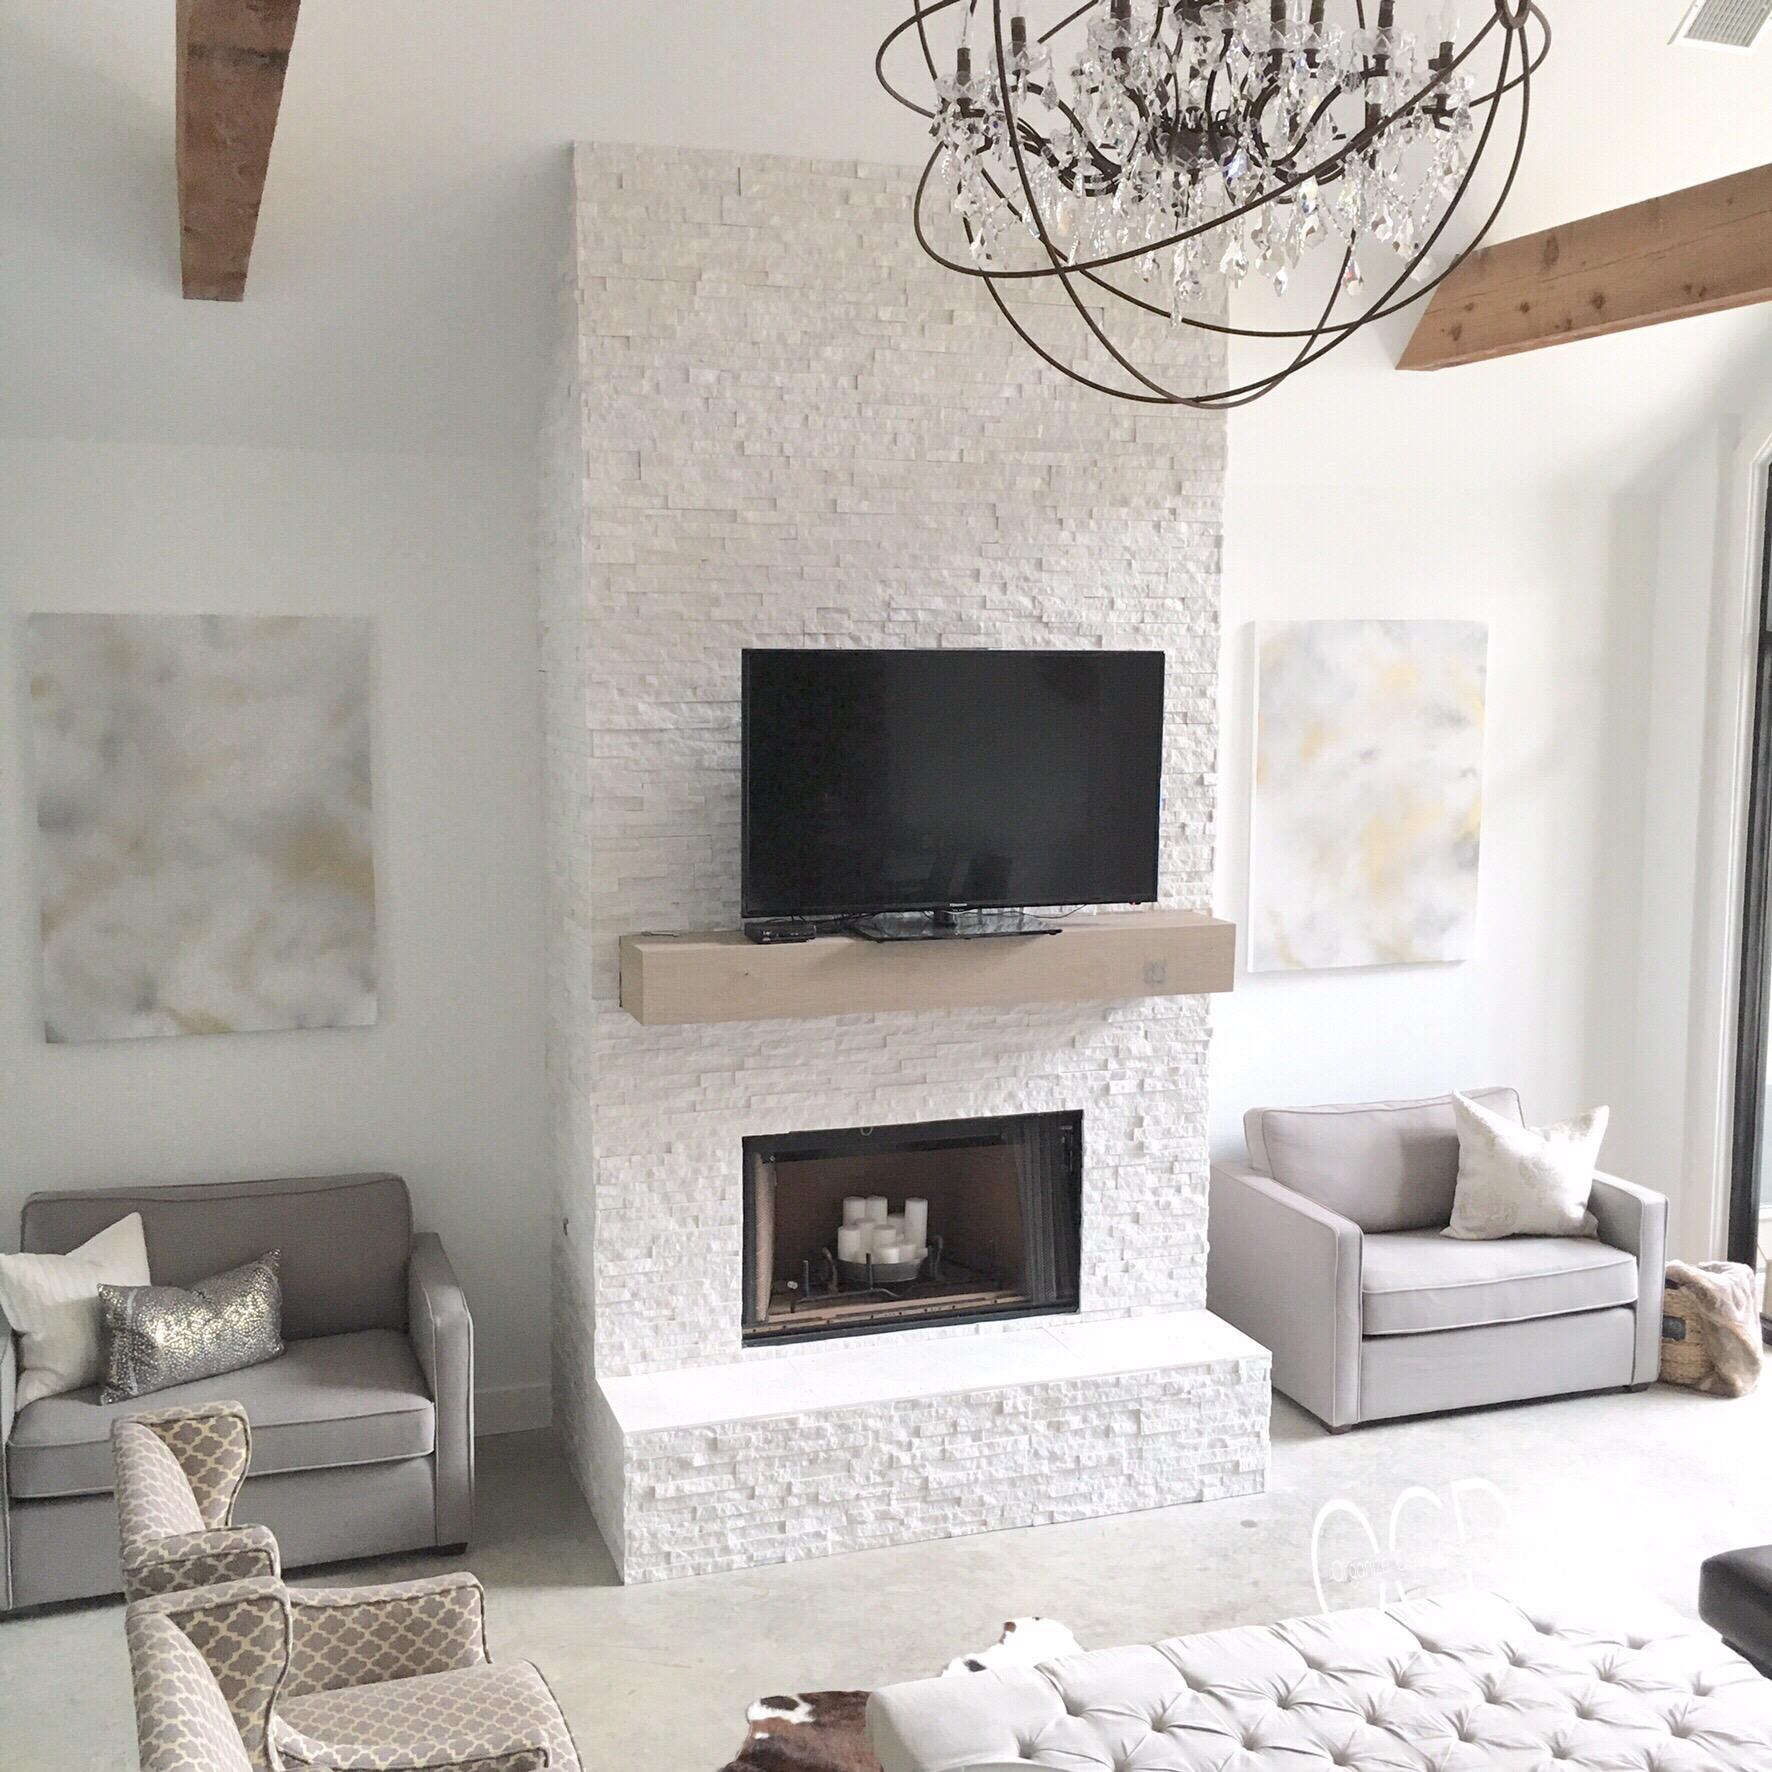 Living Room Tour Organize Clean Decorate